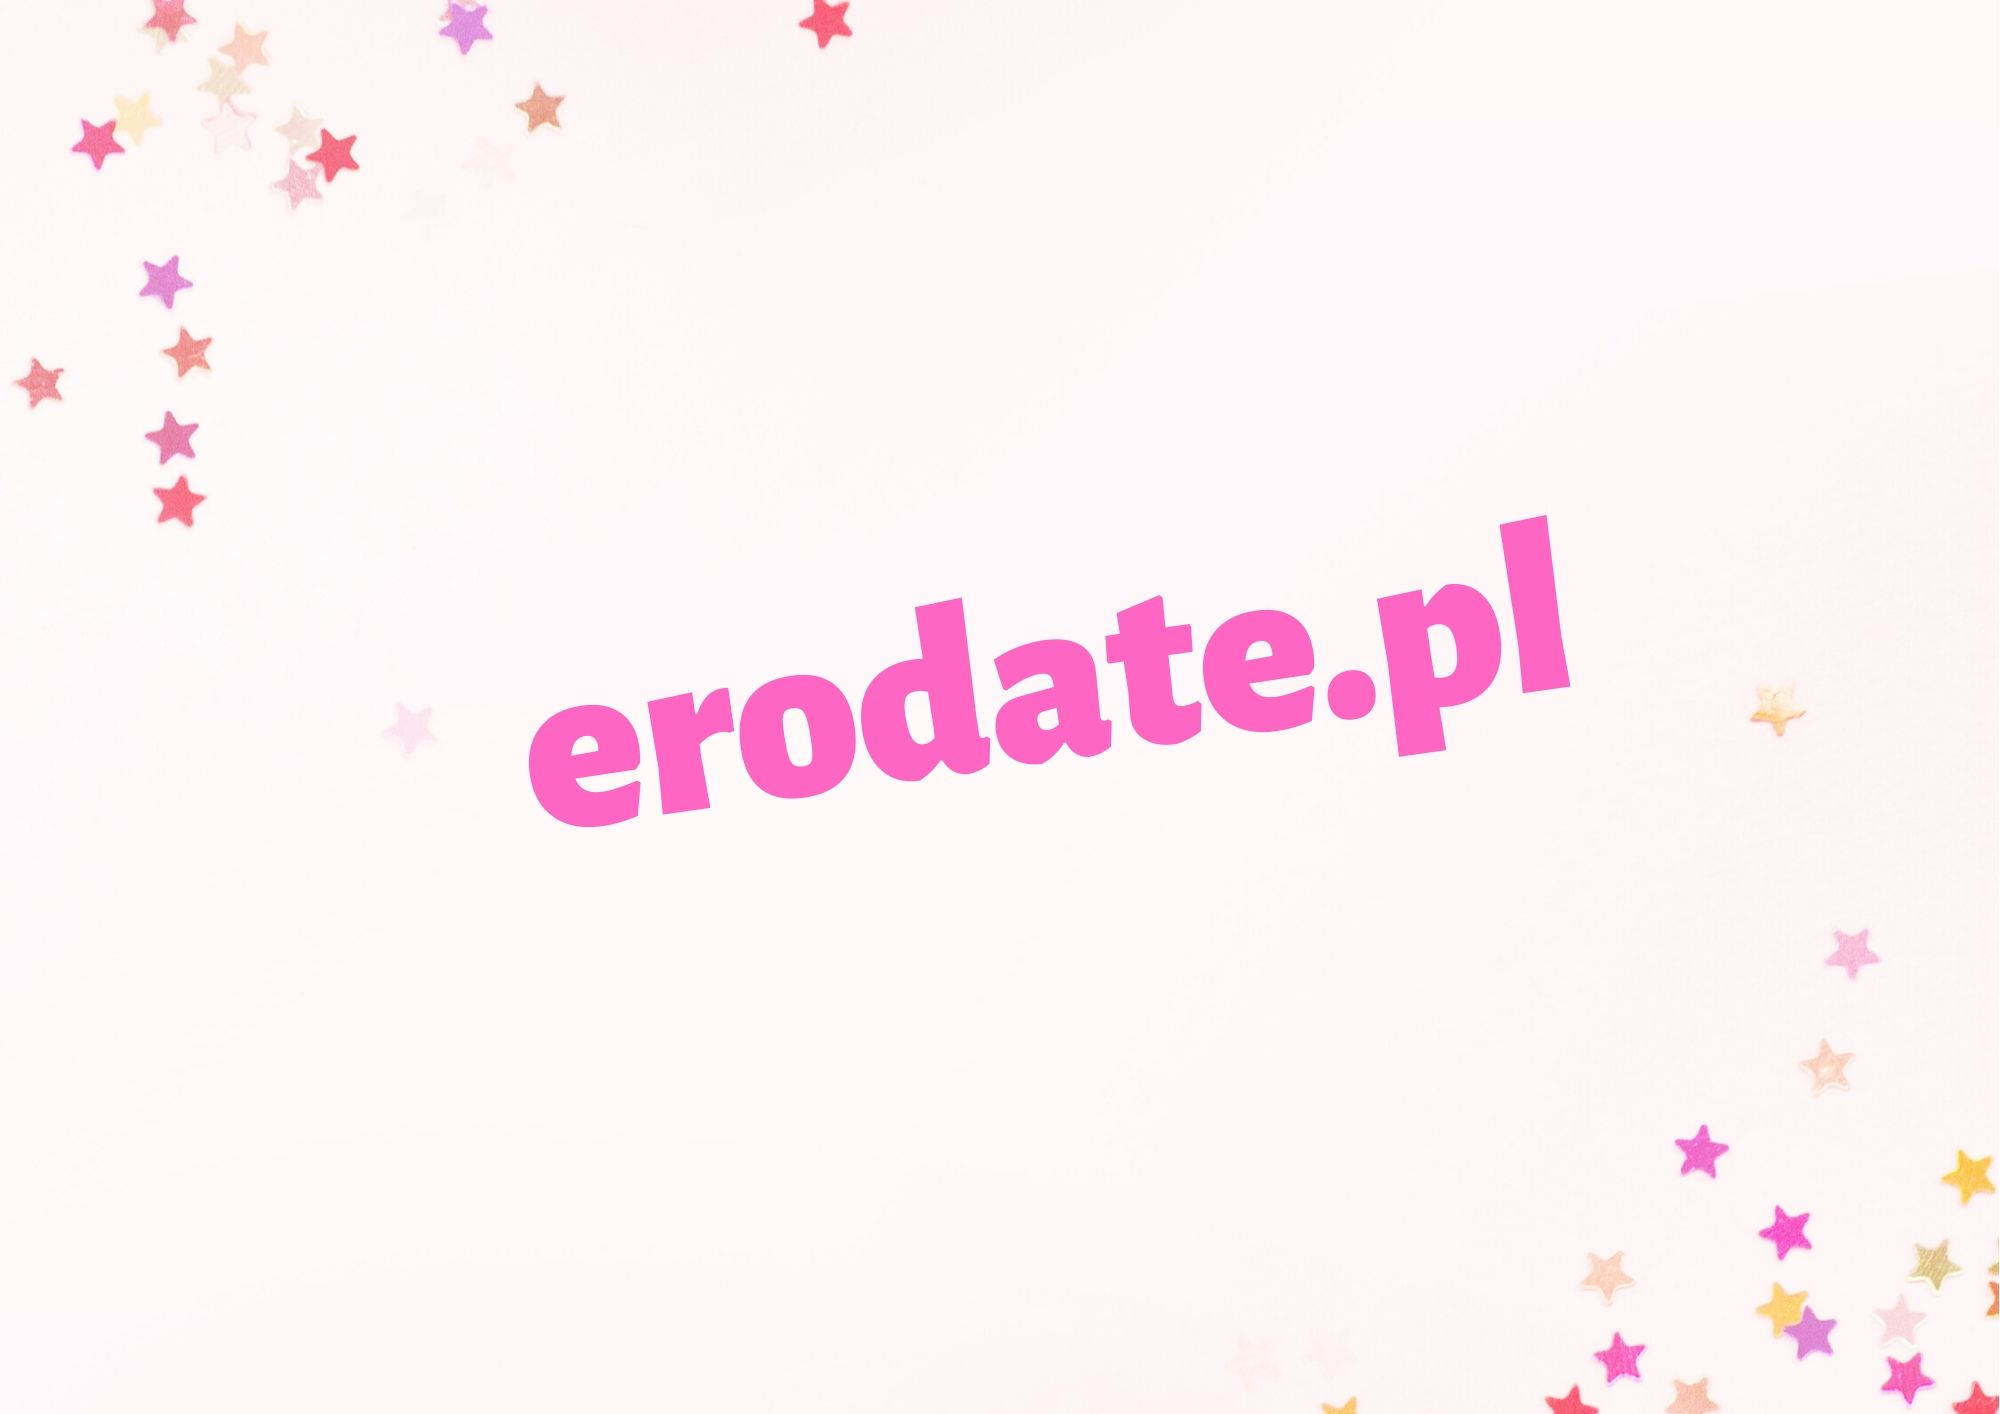 erodate.pl